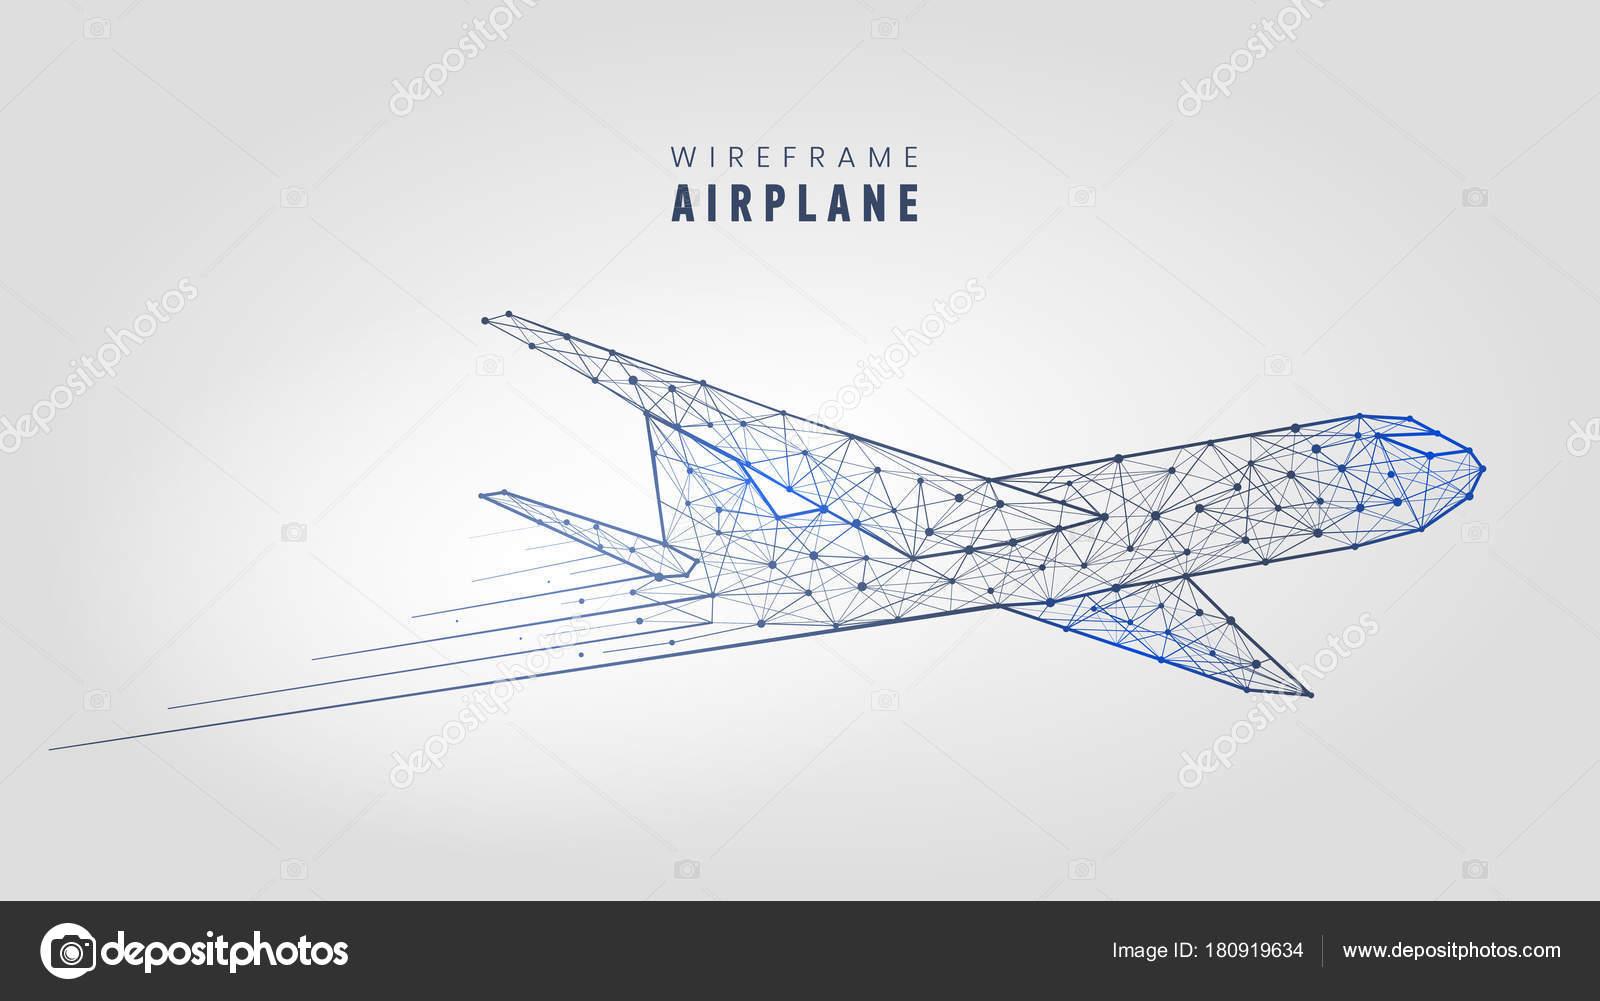 Wireframe Bird Flying Wire Center 00 Authorrebekka Keyword Radio Control Car Receiver Fromseekic Polygonal Airplane Structure Template Low Poly Plane On Rh Depositphotos Com Beautiful Birds Cartoon